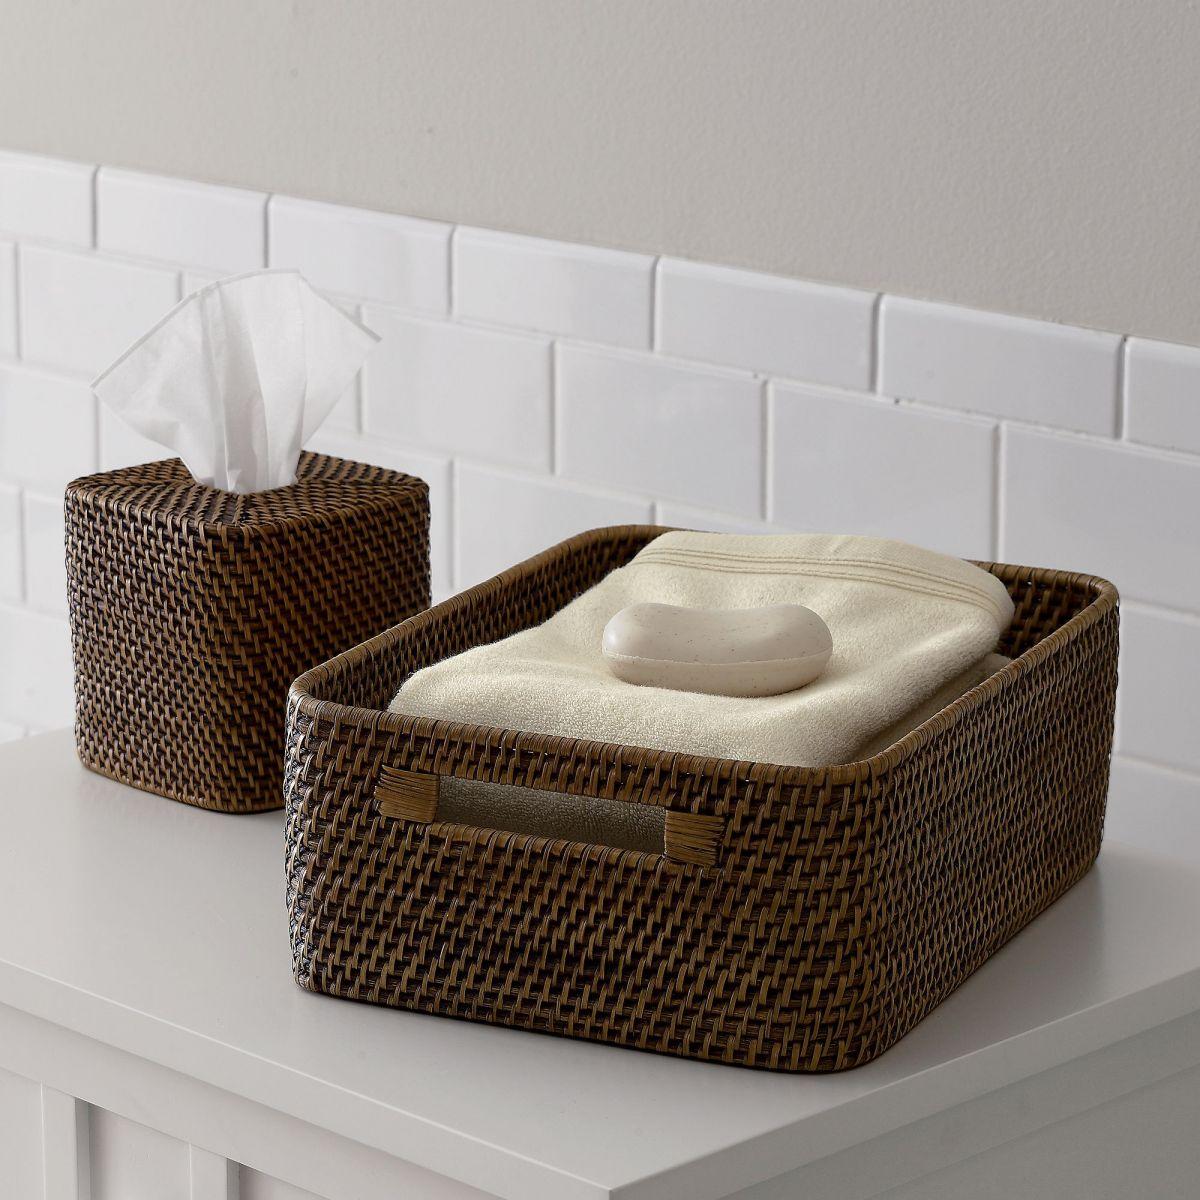 Bath Baskets # DK20